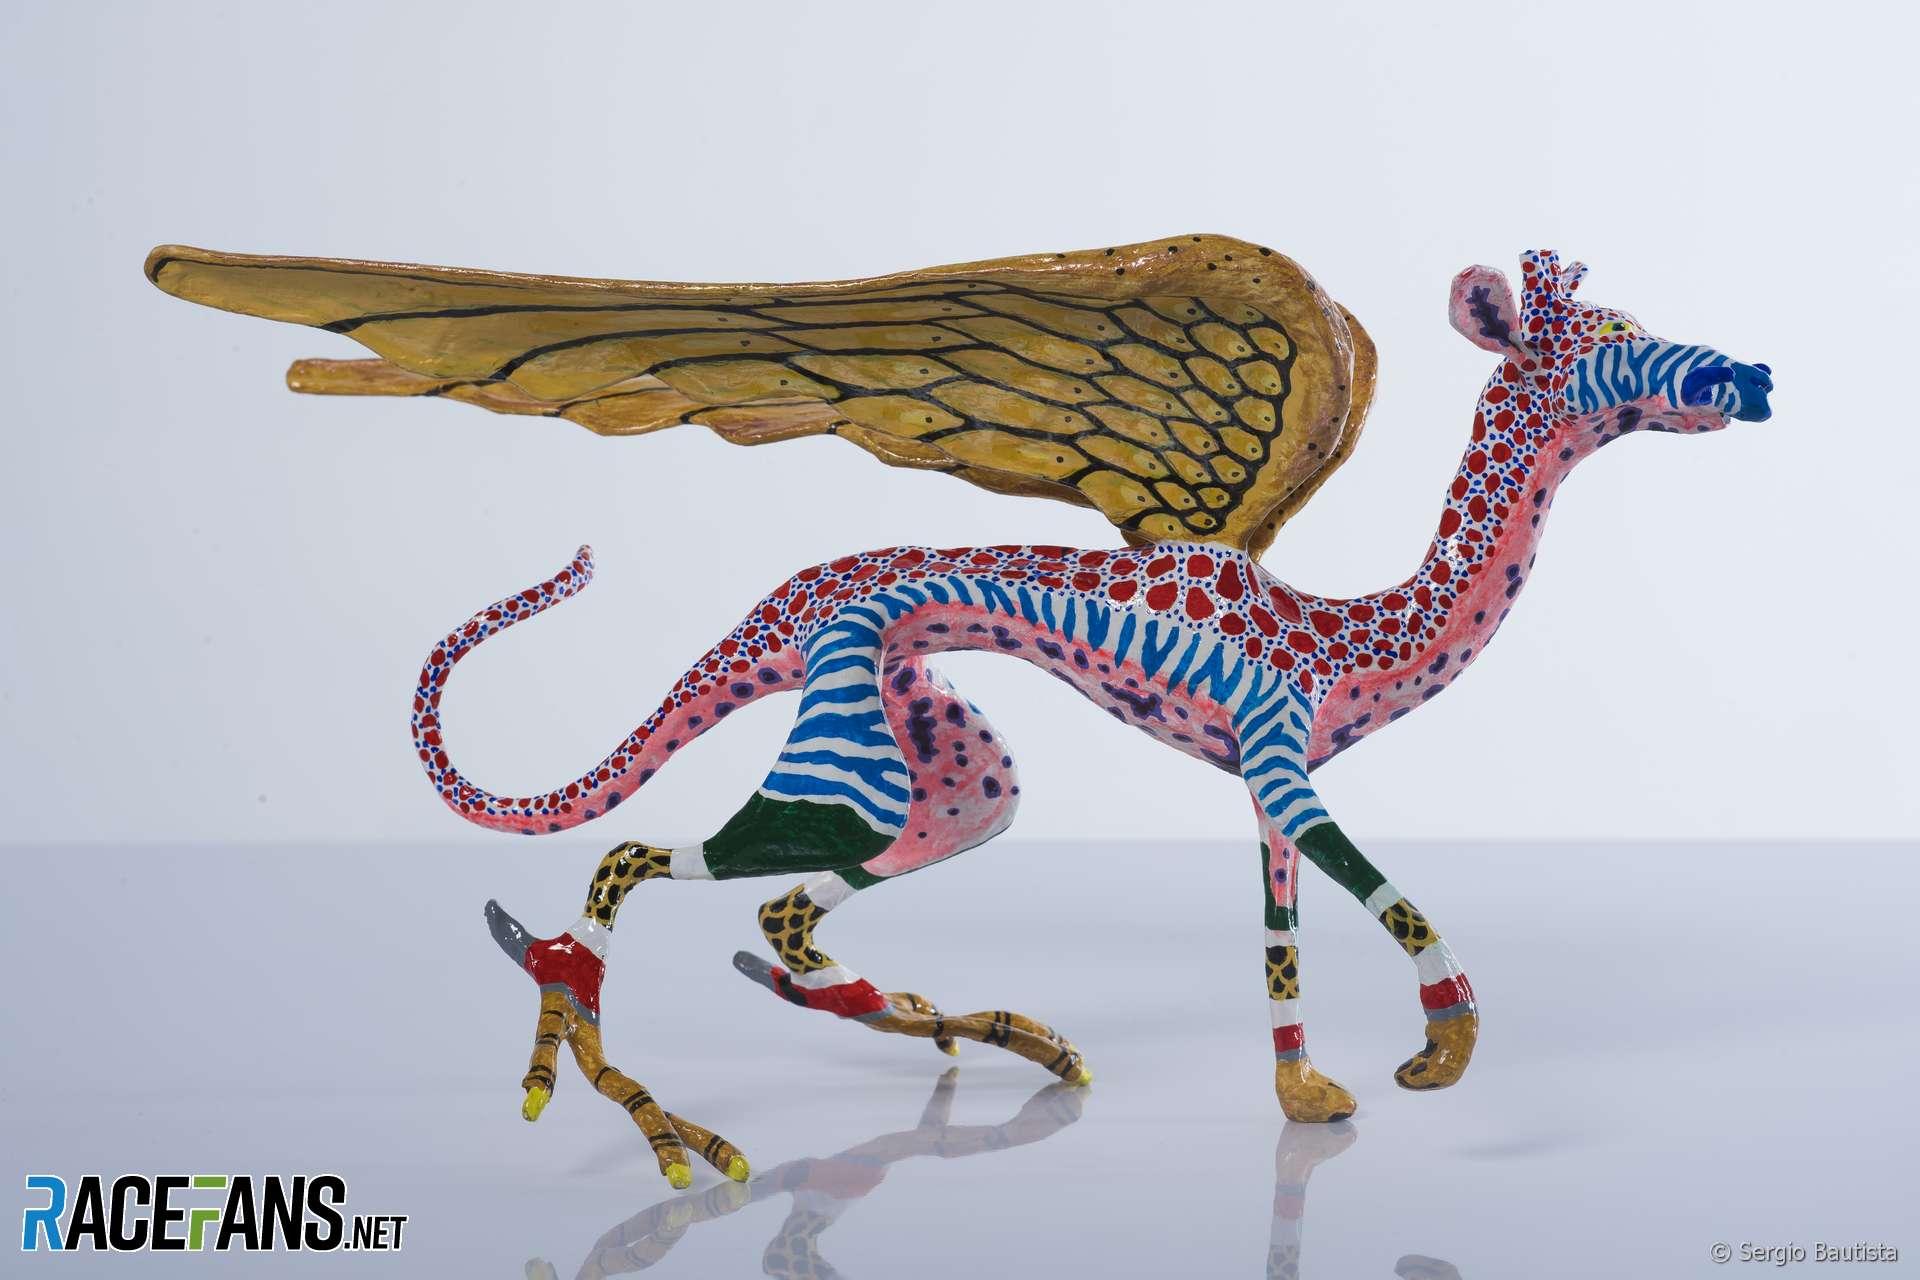 Romain Grosjean: Gallic rooster, imperial eagle, giraffe, cat and koala